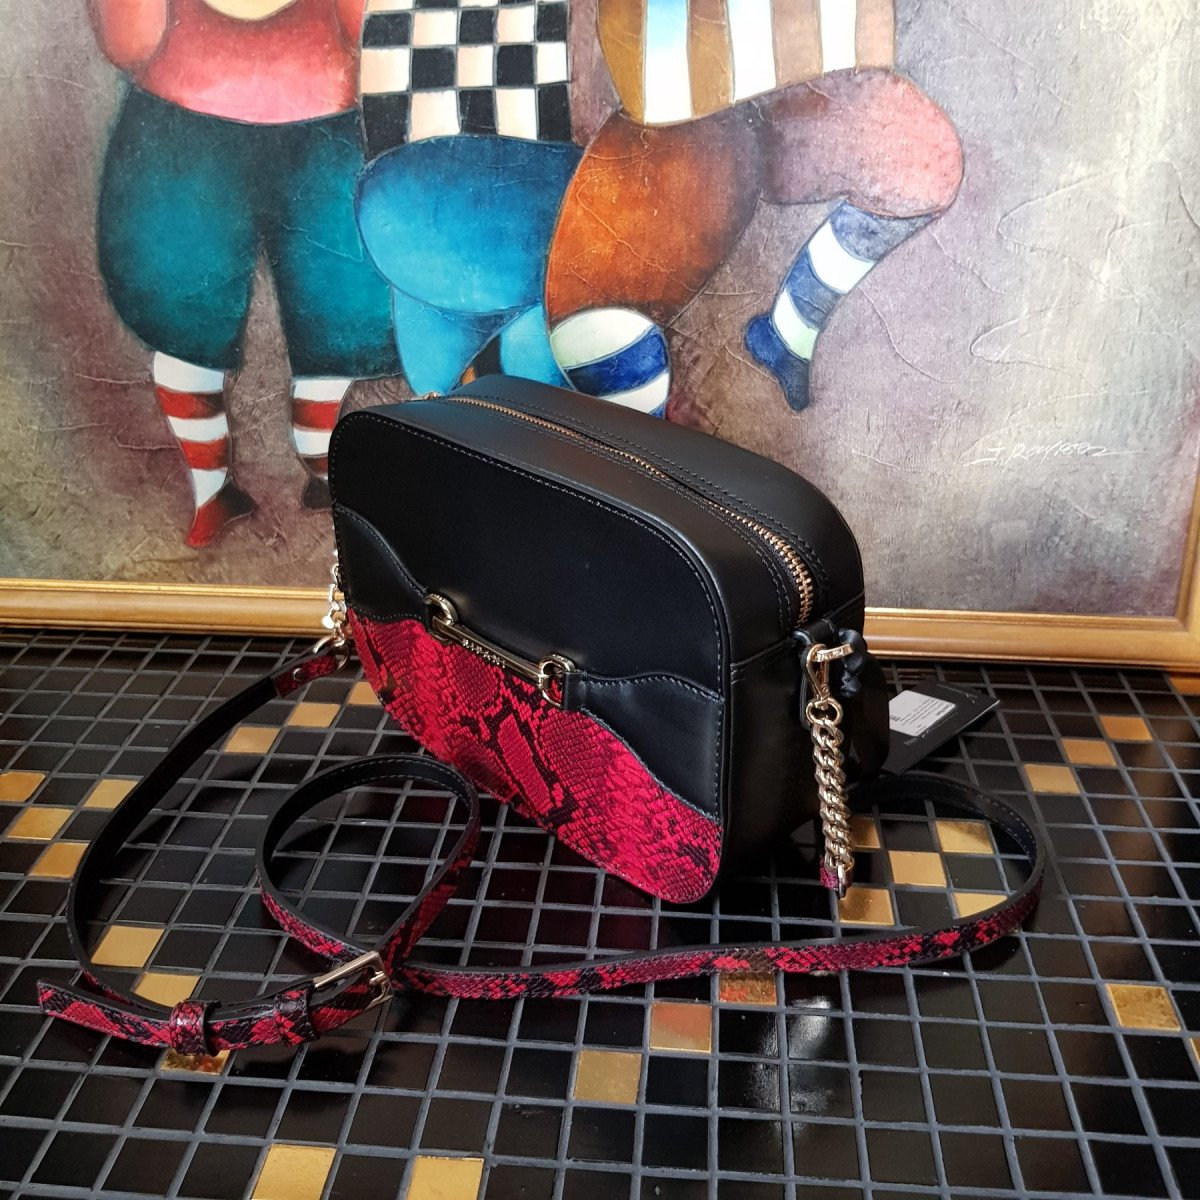 Женская кожаная сумка Ripani 2936HP.00315 Nero/rosso из натуральной кожи